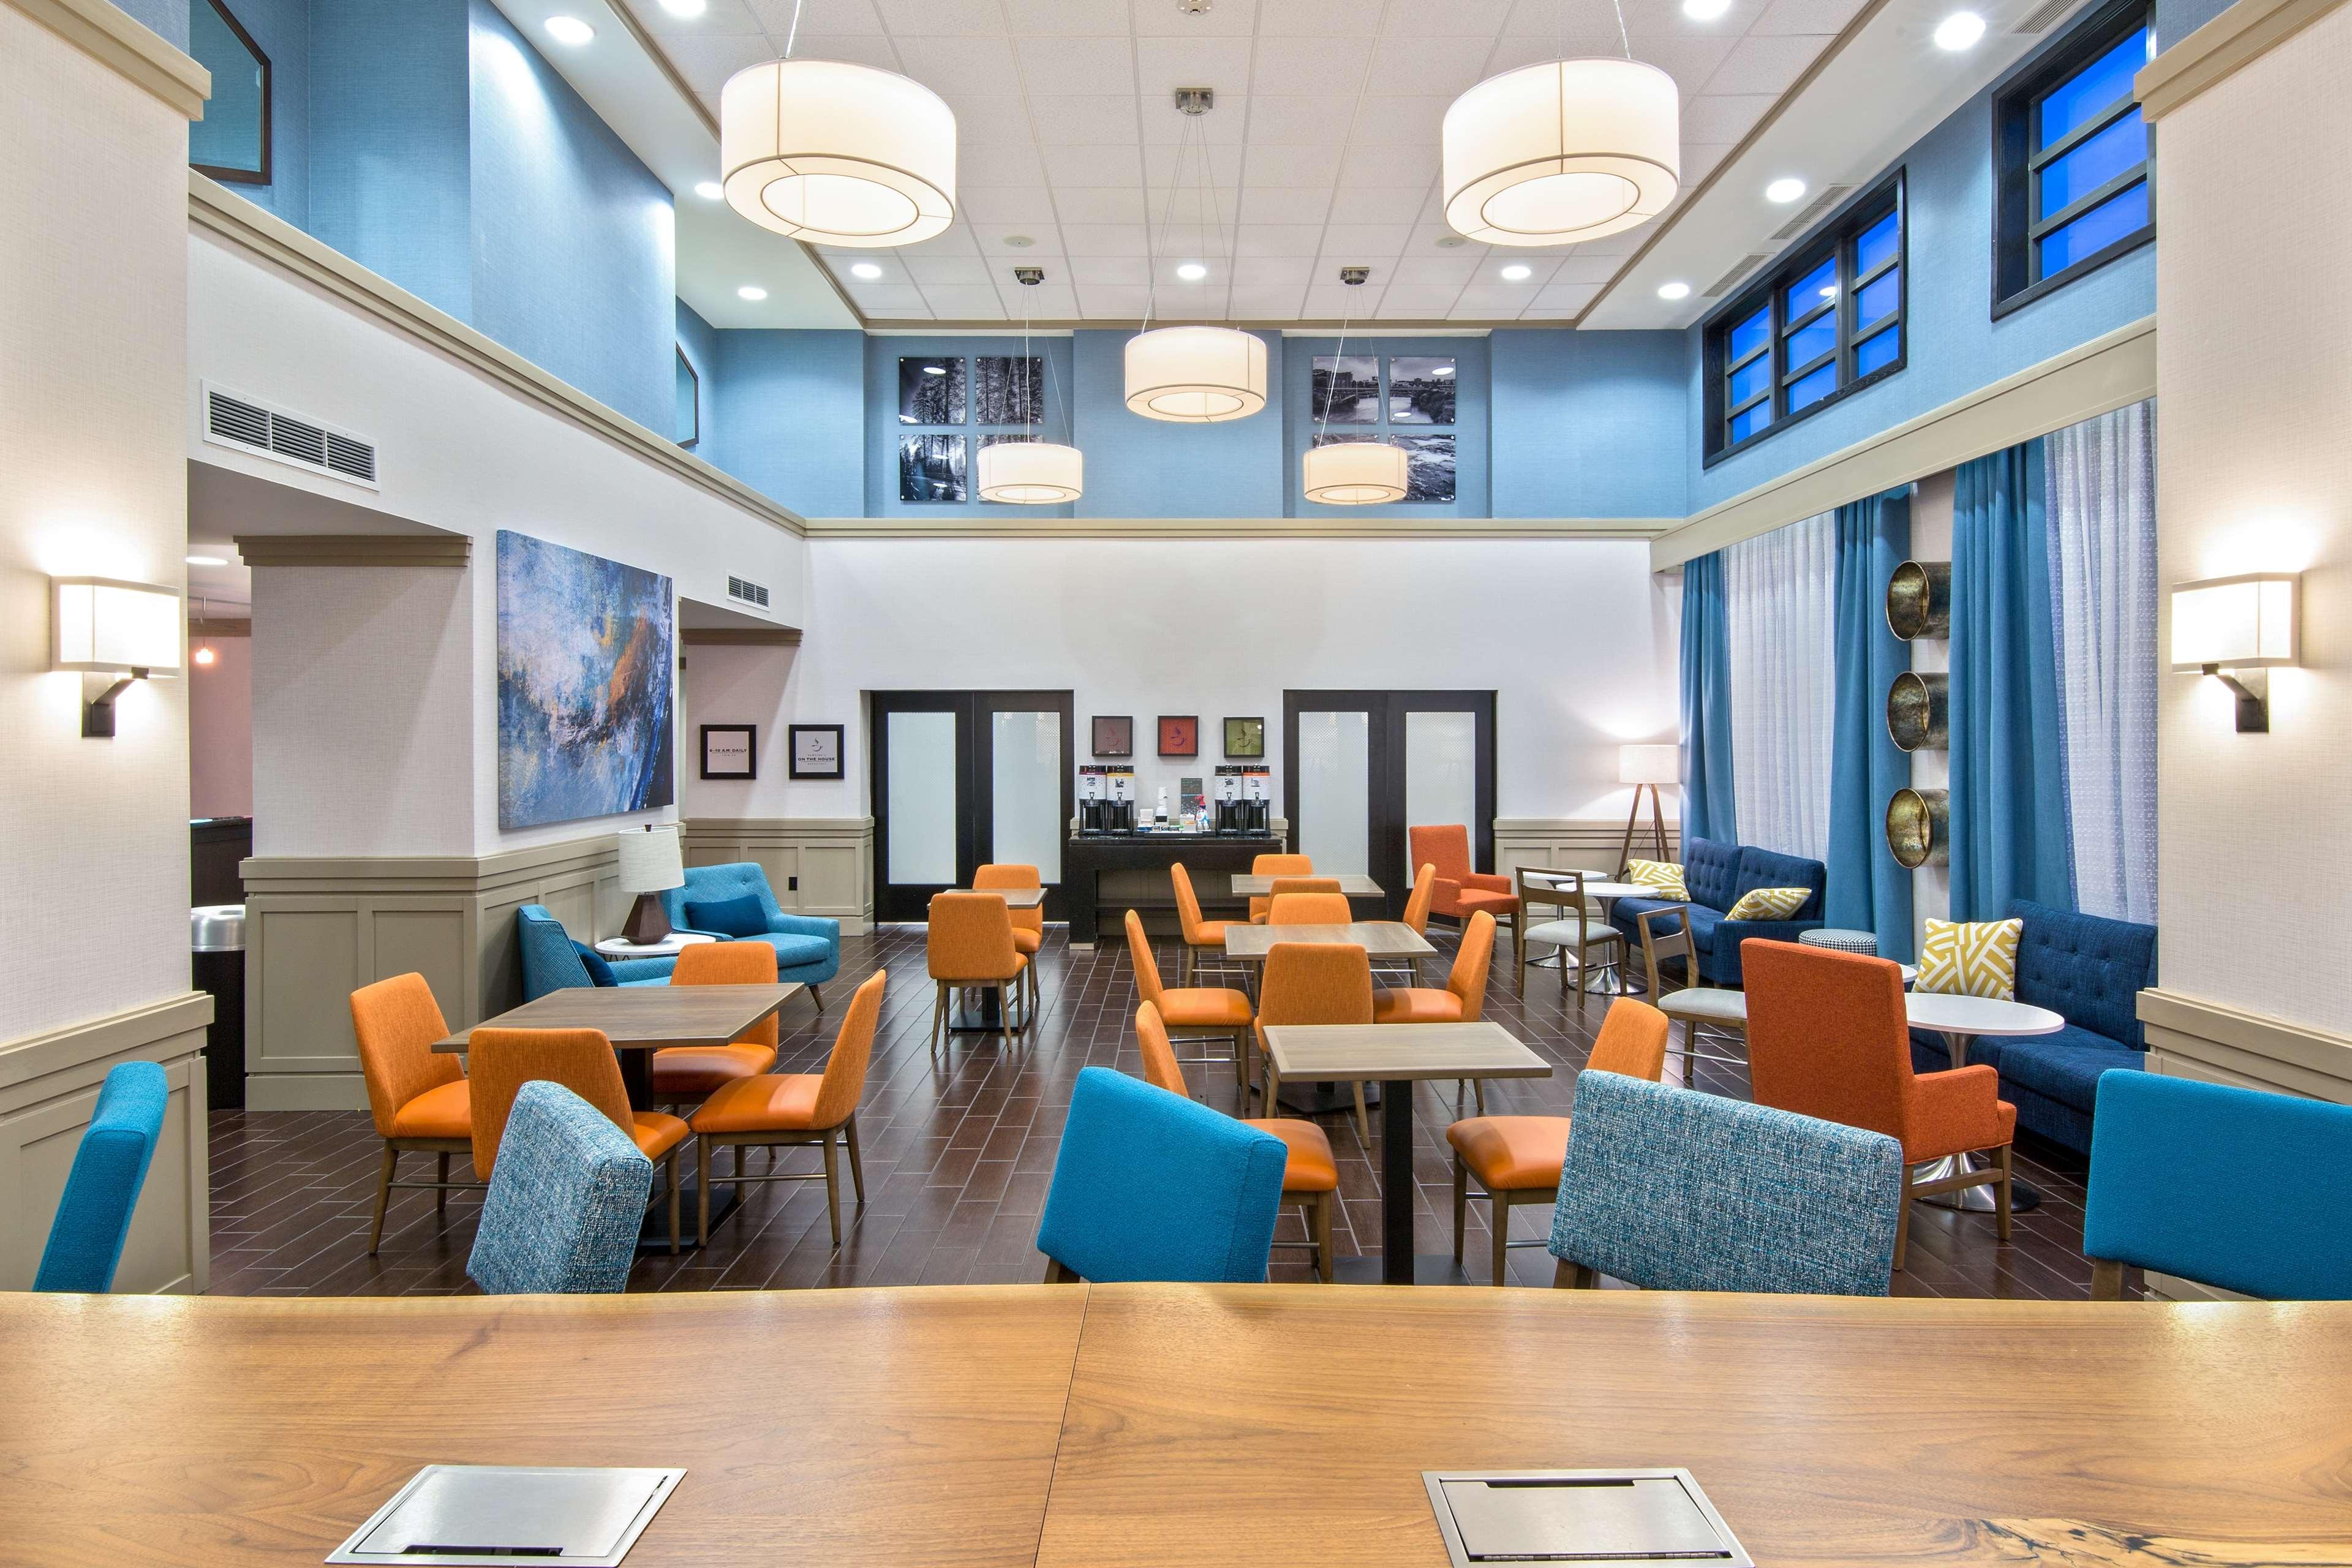 Hampton Inn & Suites Spokane Valley image 4